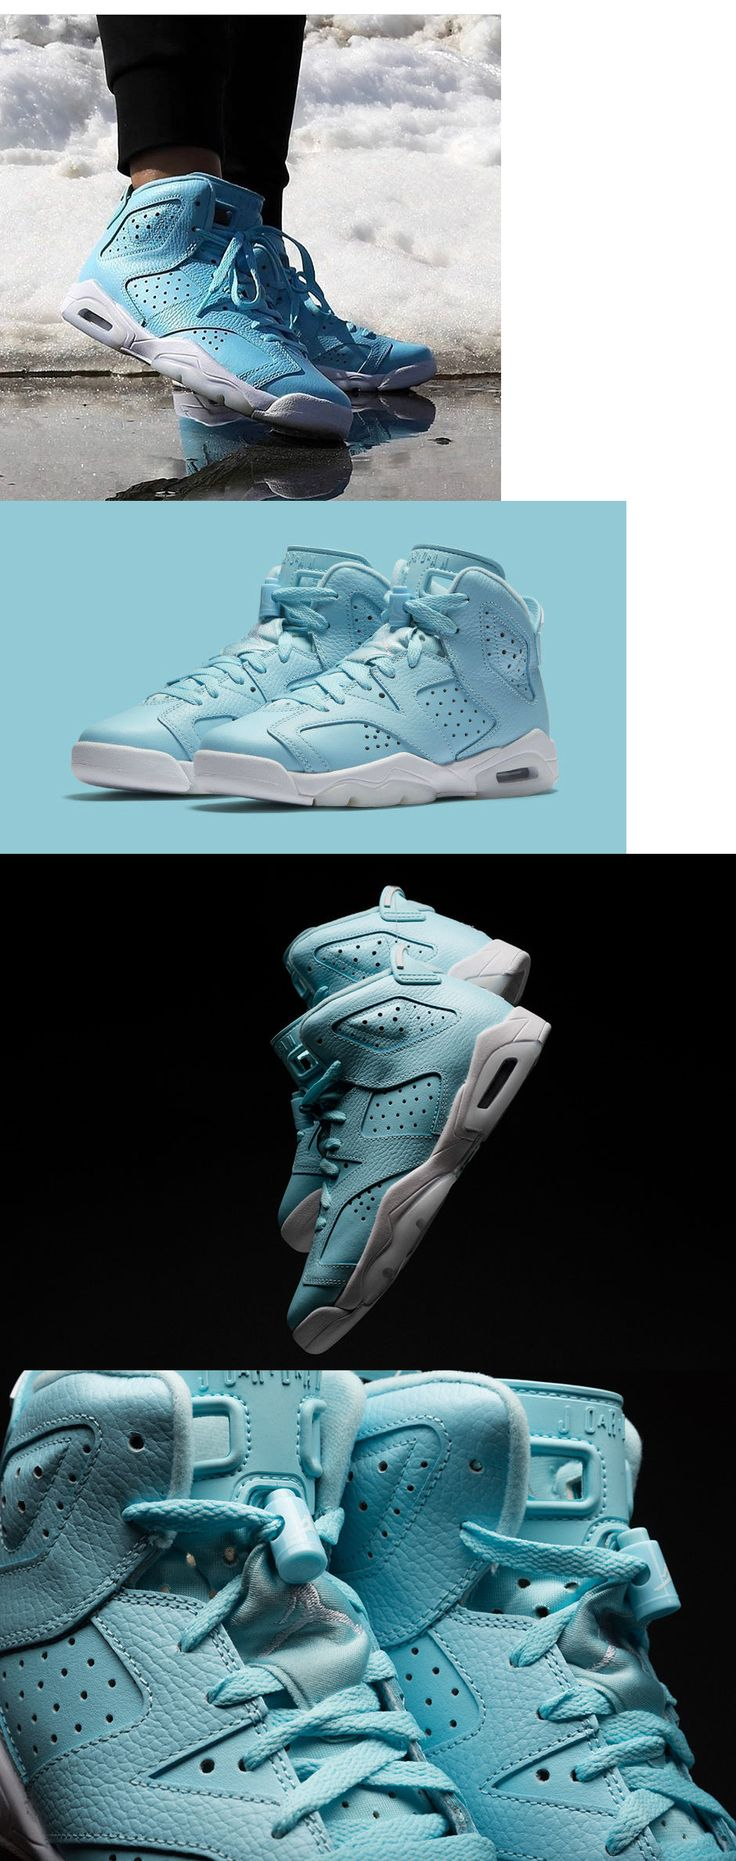 Unisex Shoes 155202: Air Jordan Vi 6 Retro Still Blue Grade School Youth Shoes Us Gs 5-9.5 543390-407 -> BUY IT NOW ONLY: $89.99 on eBay!